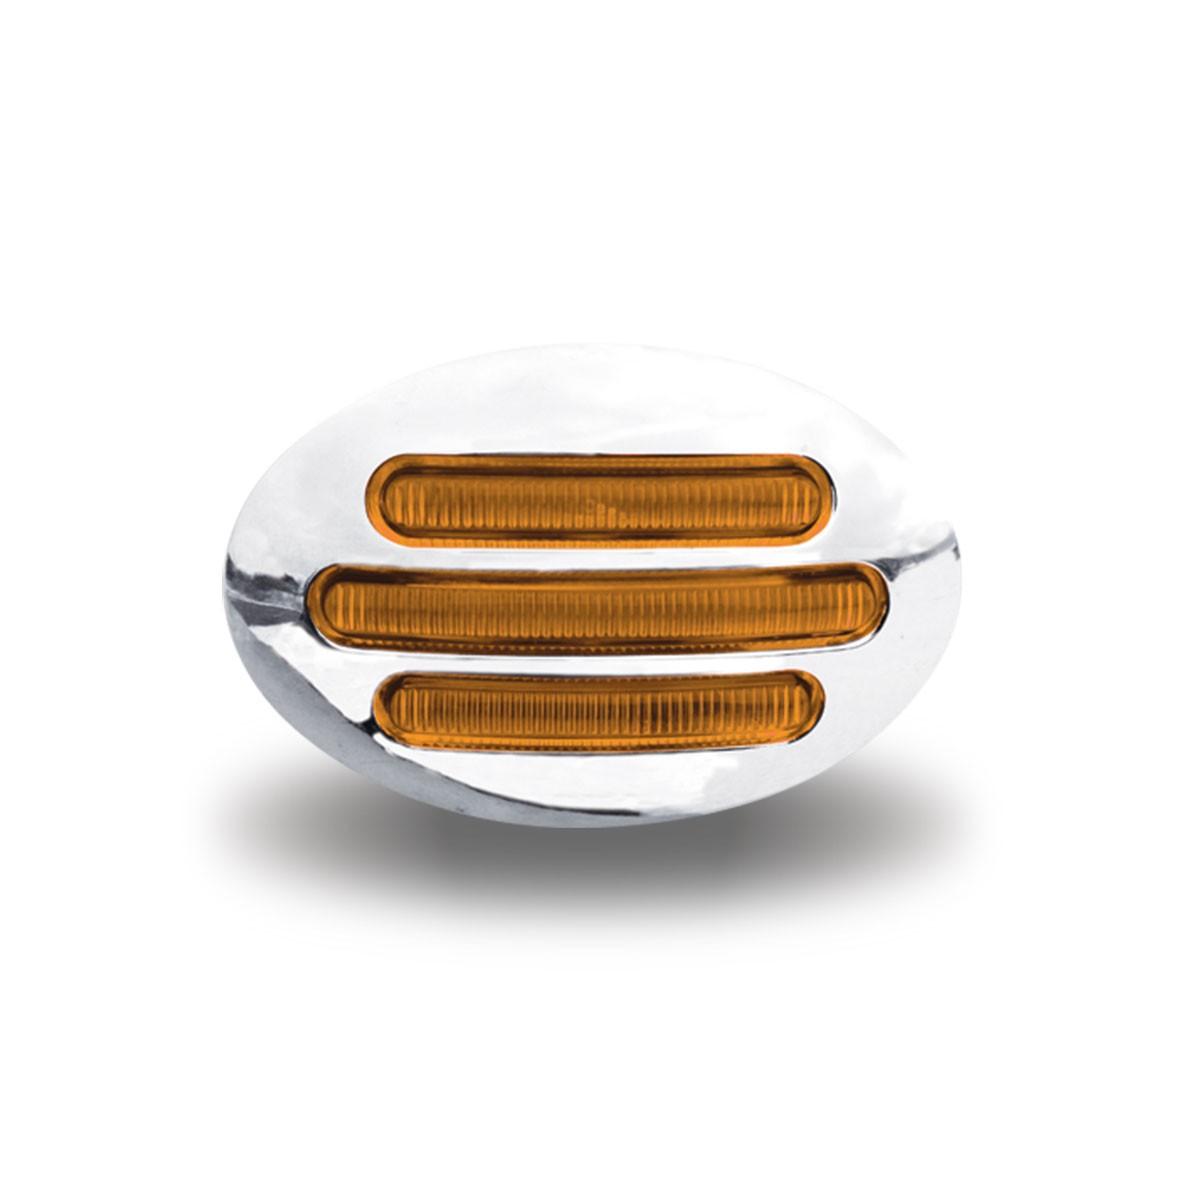 Flatline Amber LED (13 Diodes) Small Marker - Amber LED with Amber Lens